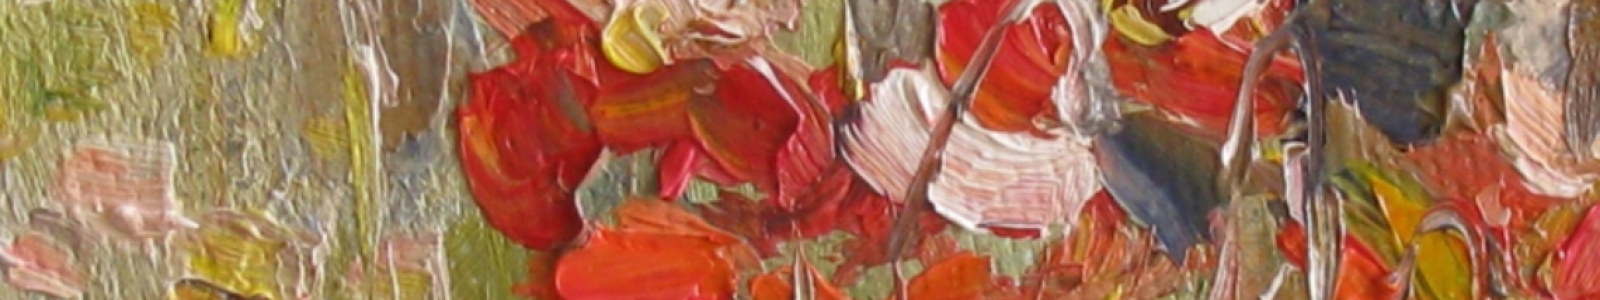 Gallery Painter Irina Kruglova